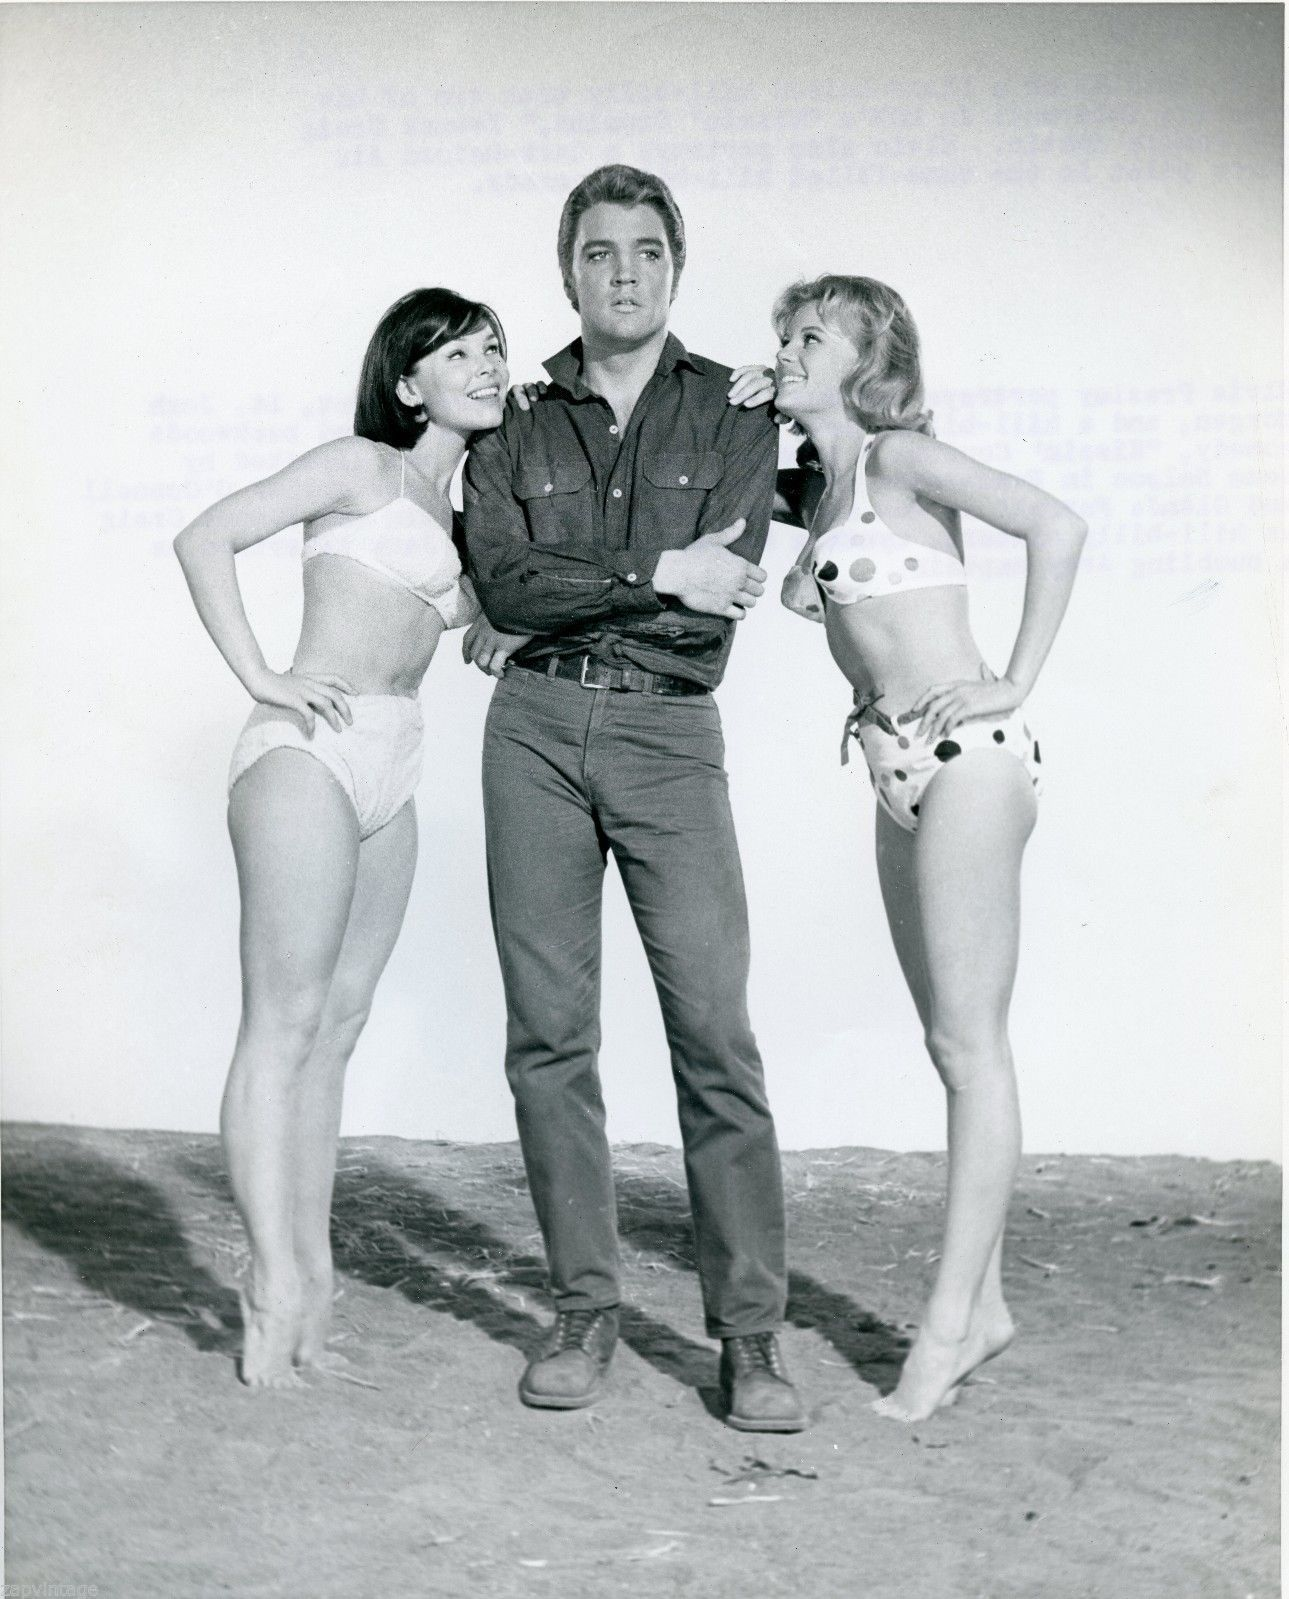 Dale Fuller (actress),Sharon Cuneta (b. 1966) XXX pic Carla Gugino,Denise Darcel